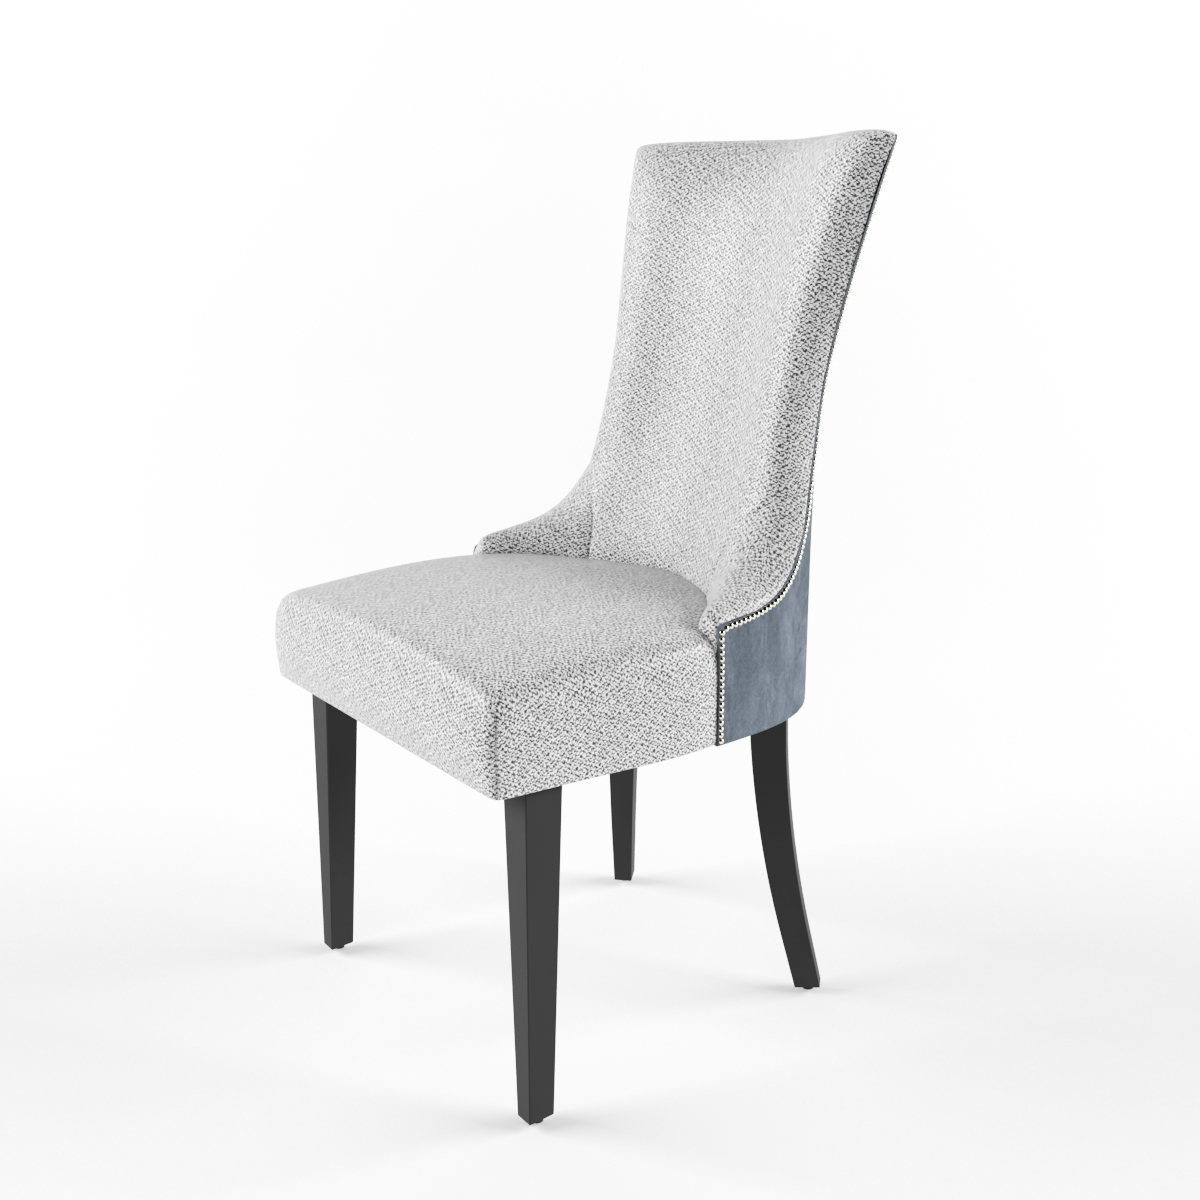 Free 3D Model Charles Chair By London Sofa U0026 Chair Company